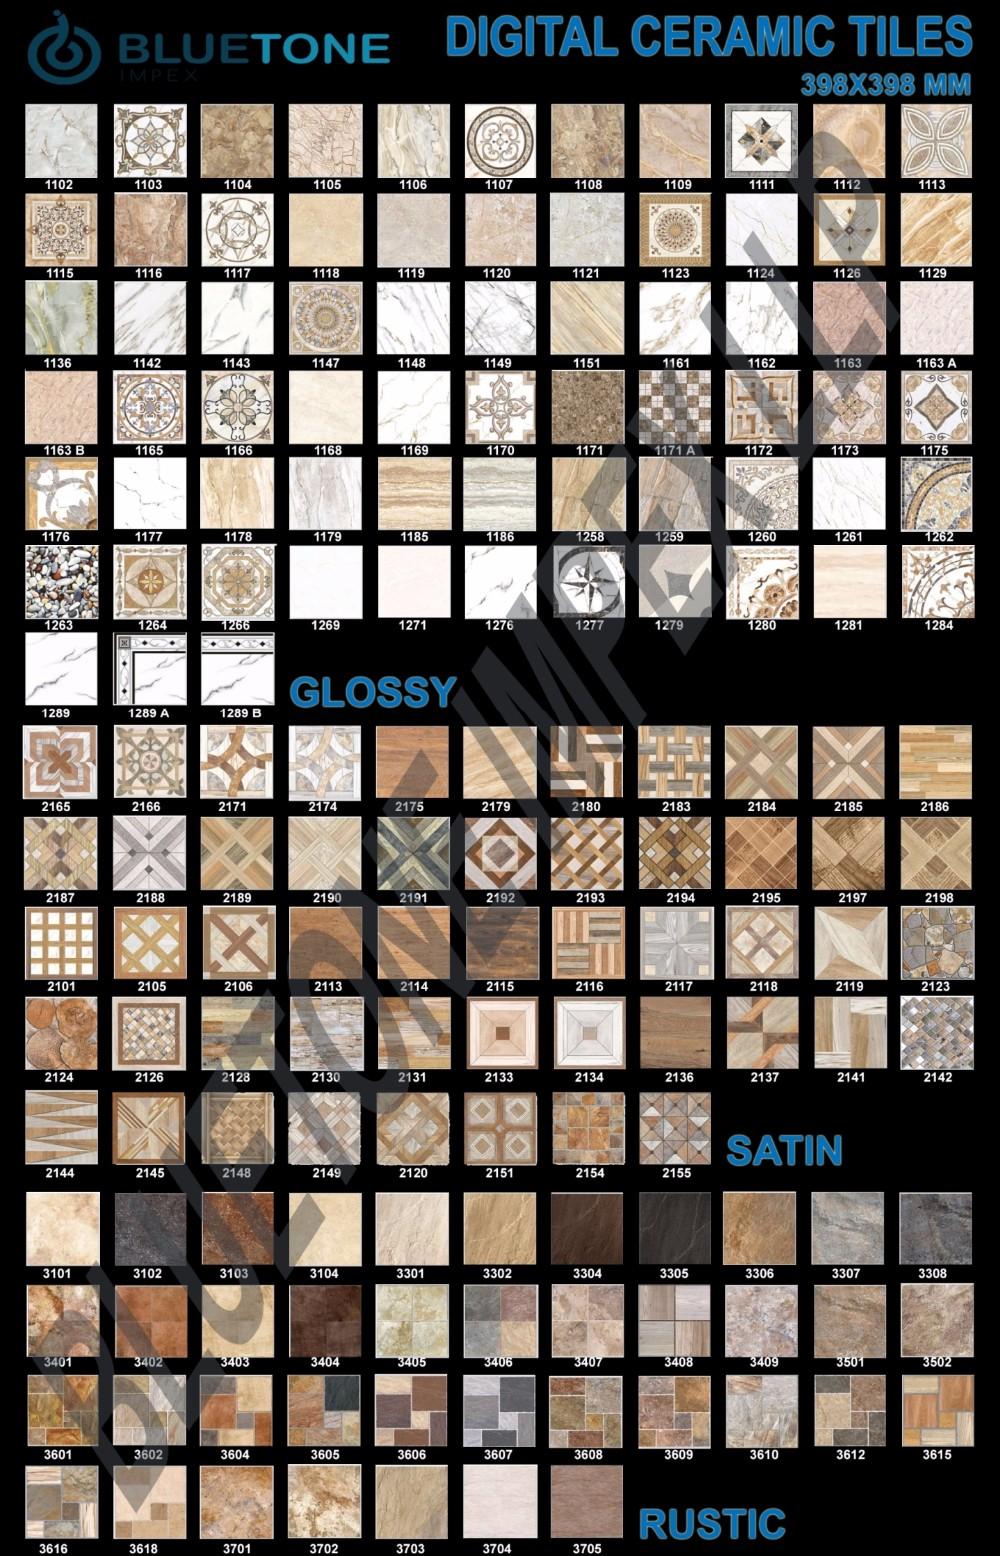 600 x 600mm home depot cheap nano polished porcelain gres porcellanato floor tiles buy 600 x 600mm home depot cheap nano polished porcelain gres